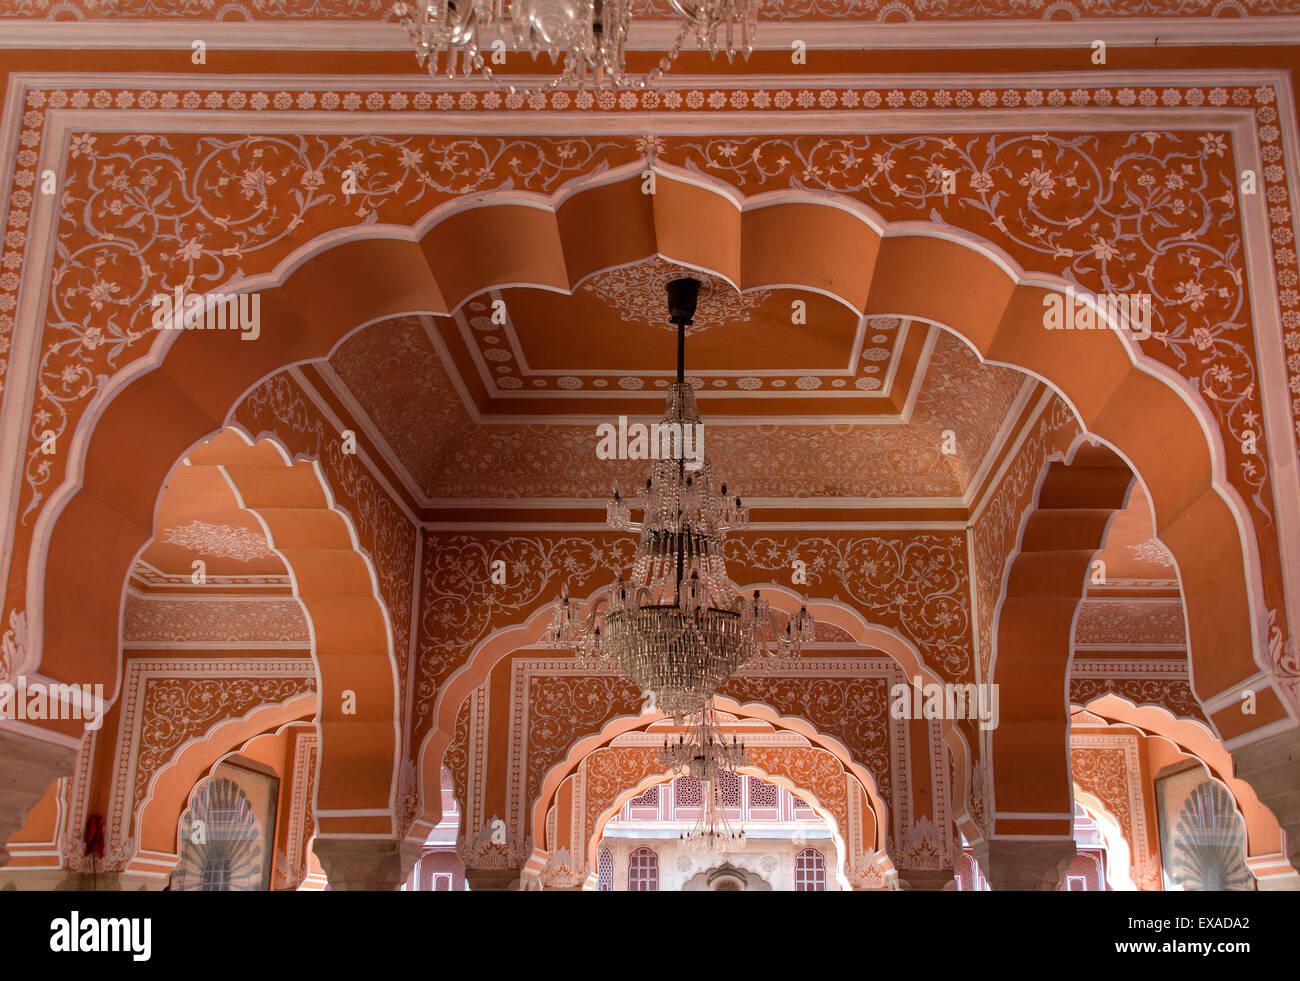 Audience hall Diwan-I-Khas in Chandra Mahal City Palace, Jaipur, Rajasthan, India - Stock Image